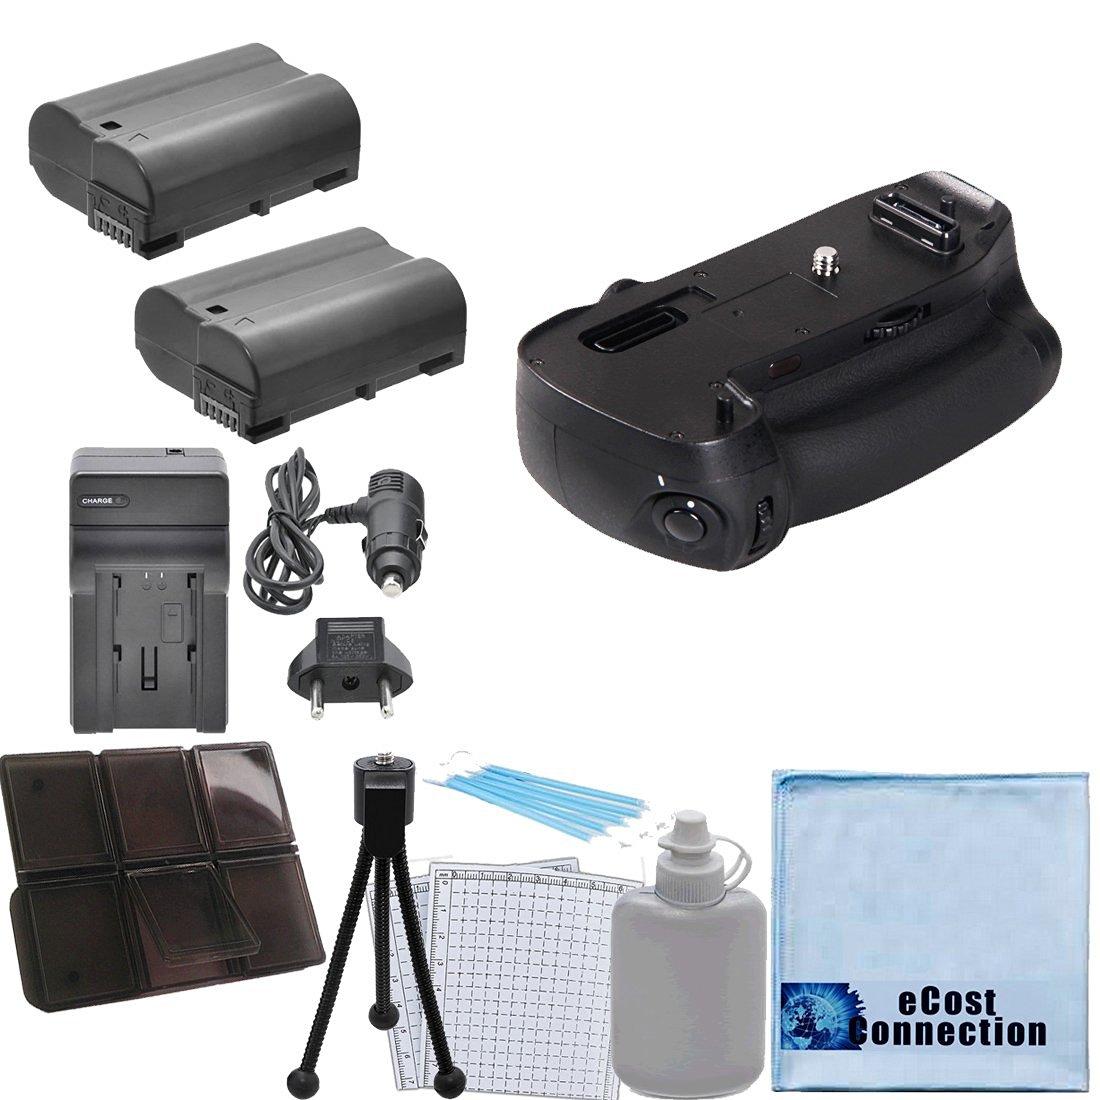 Battery Grip for Nikon D750 DSLR Camera + 2 EN-EL15 Replacement Batteries + Car/Home Charger + Memory Card Case + eCost Starter Kit   MB-D16